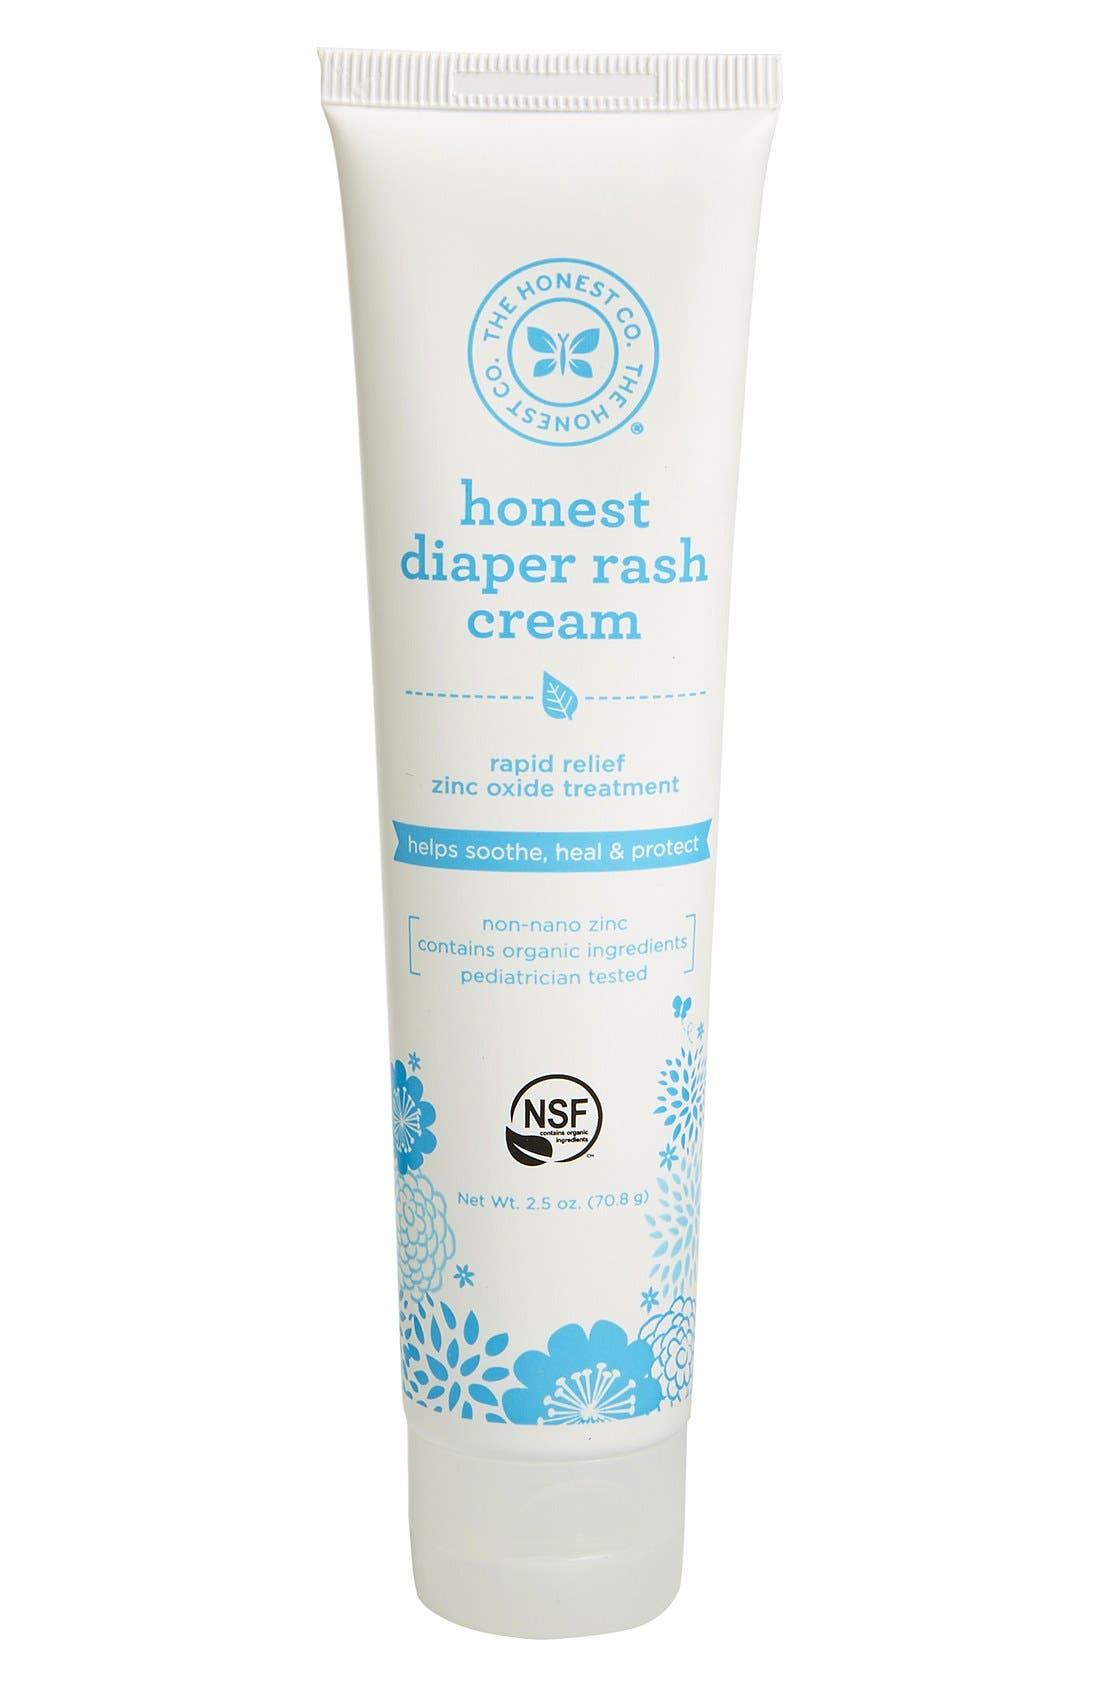 The Honest Company Diaper Rash Cream